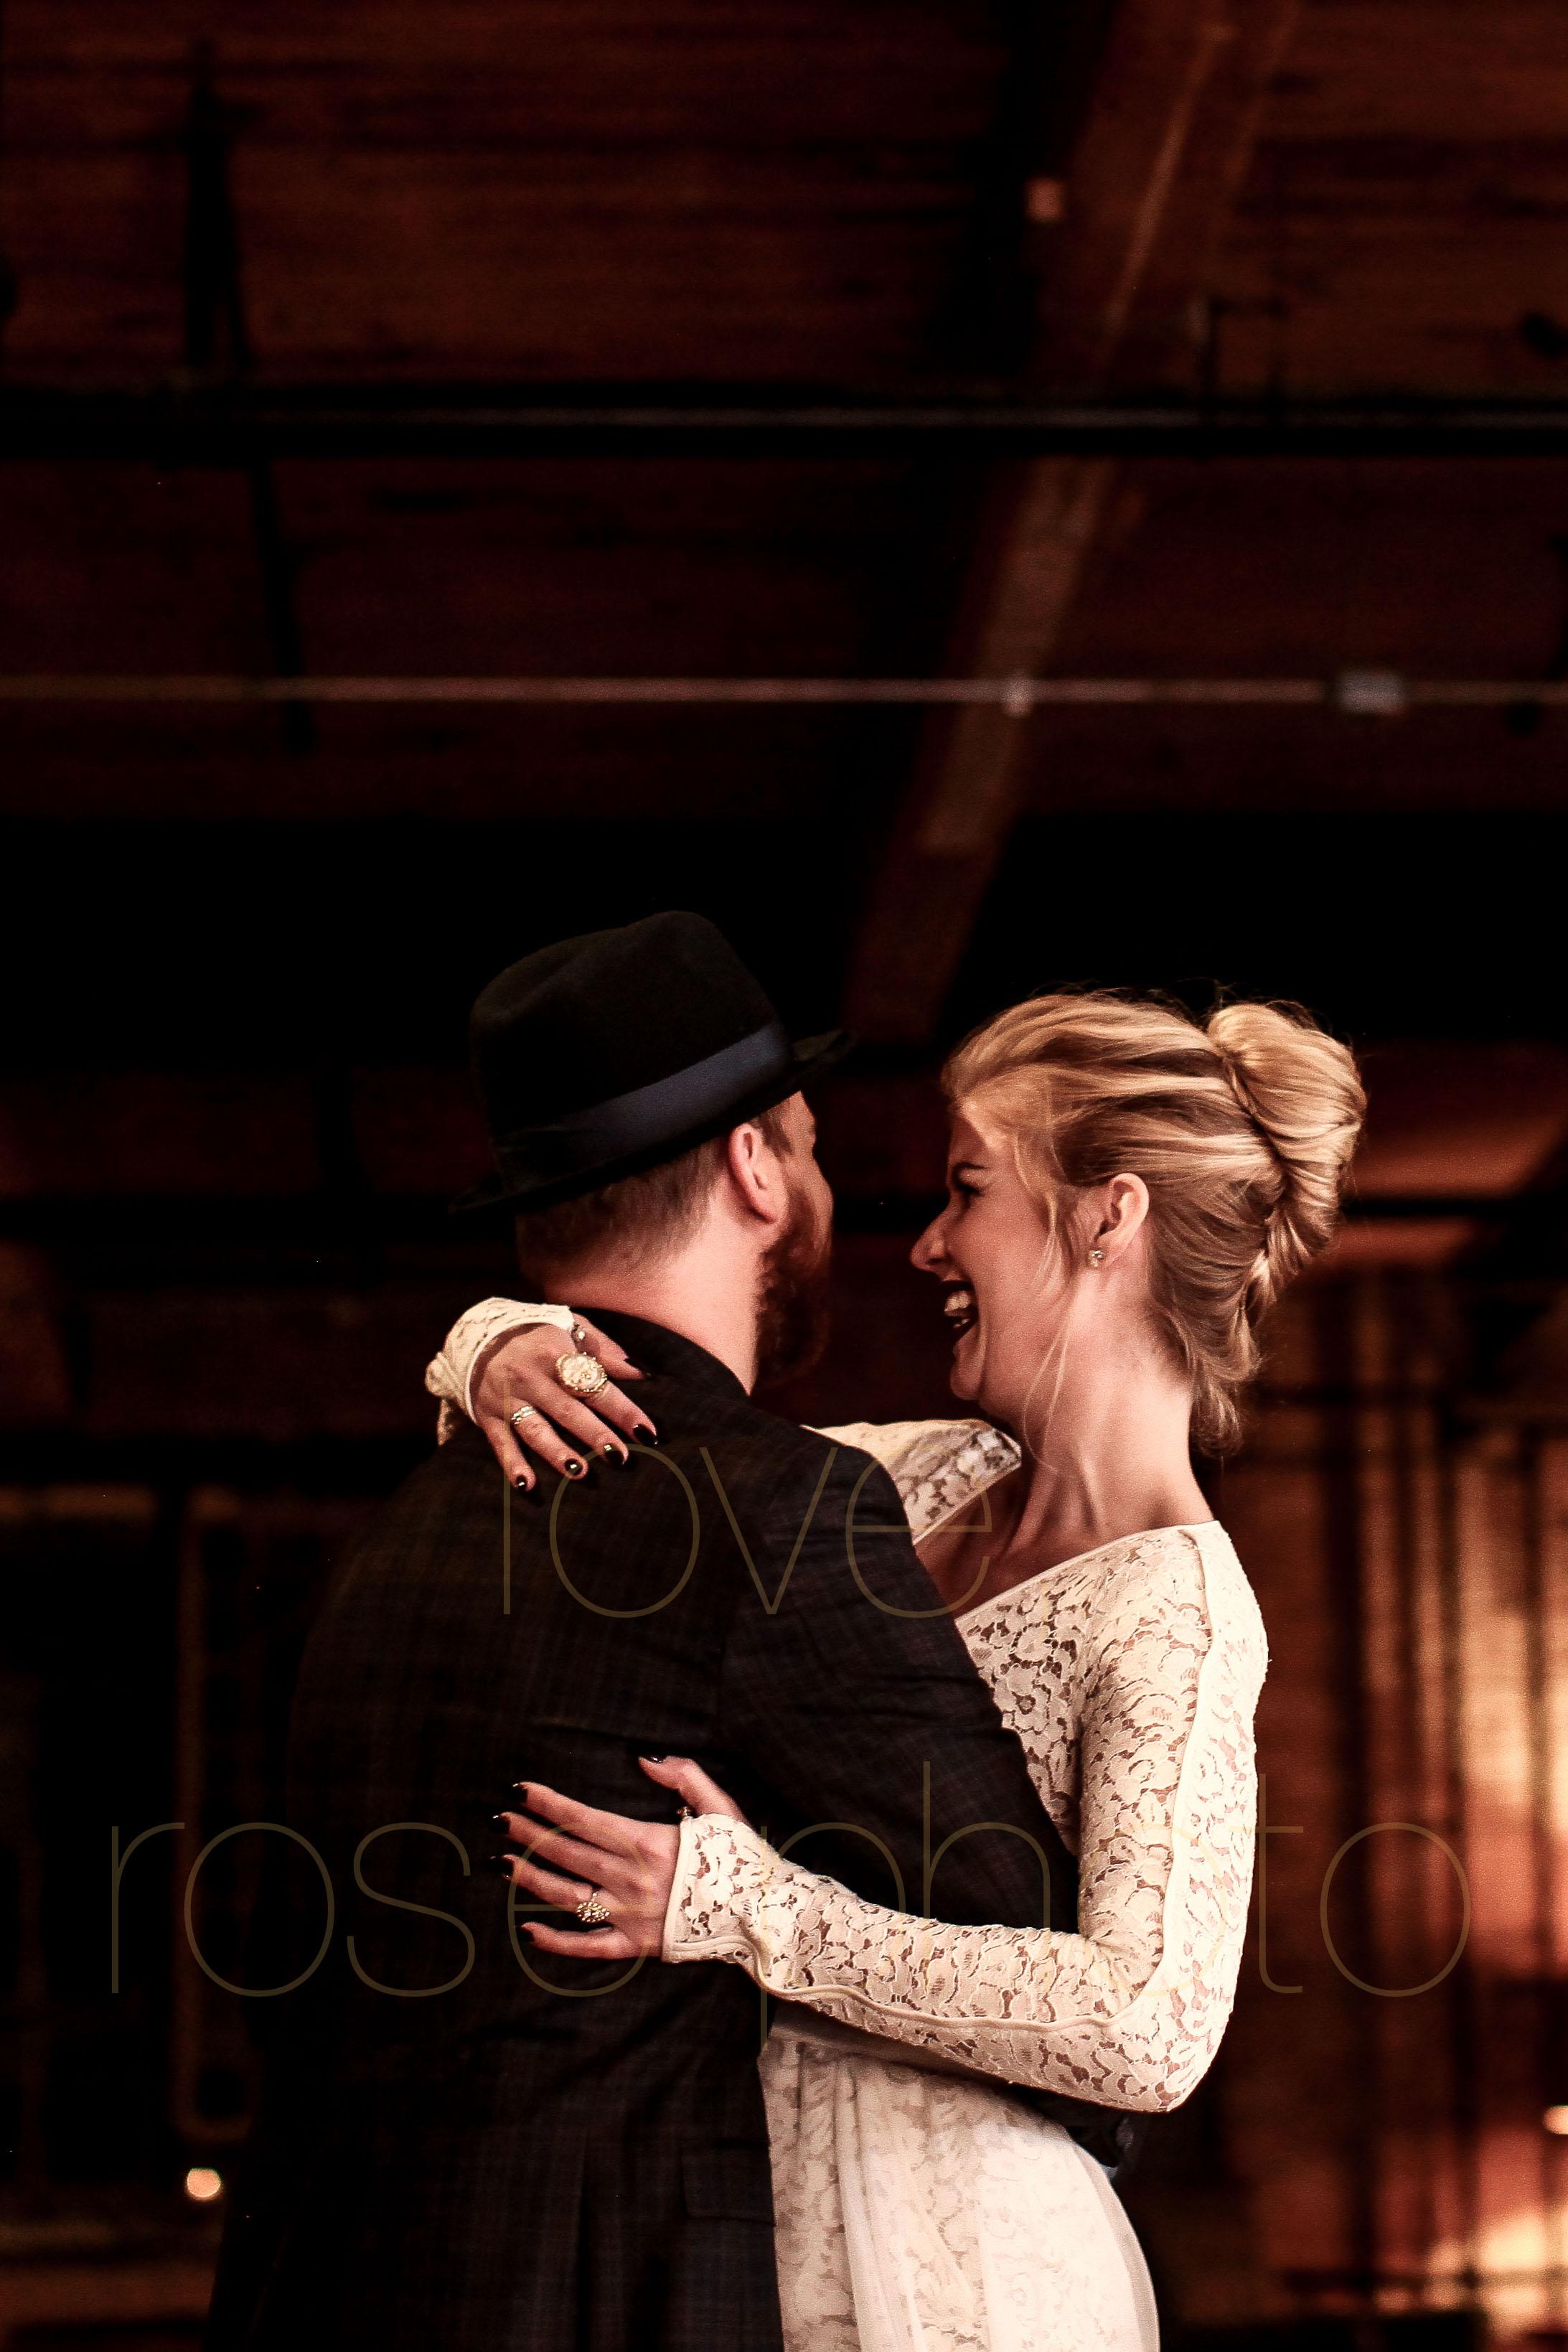 West Fulton Chicago Wedding Venue Salvage One photography enagement photos bride groom first dance-31.jpg